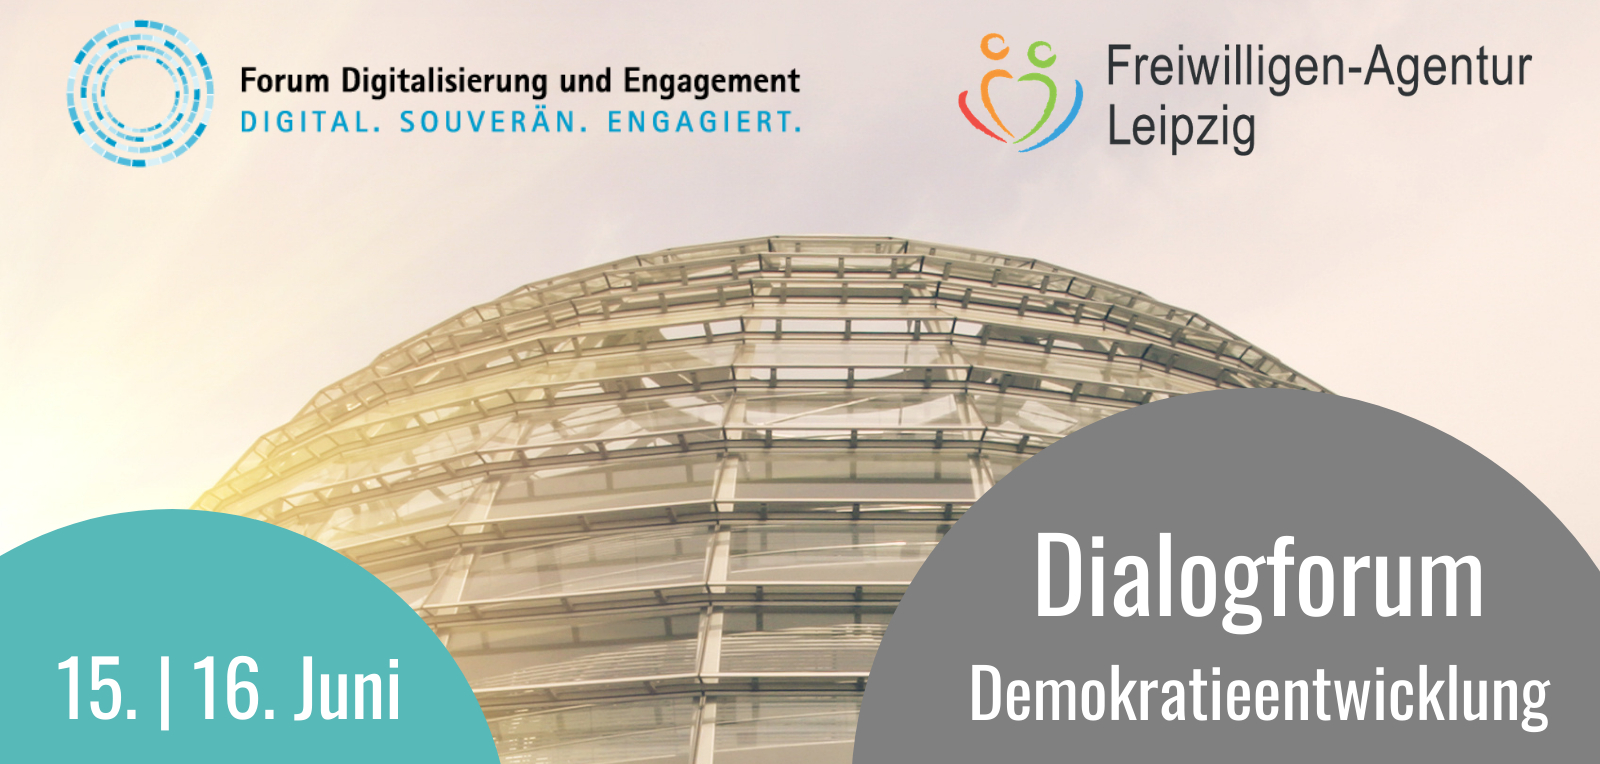 Dialogforum Demokratieentwicklung